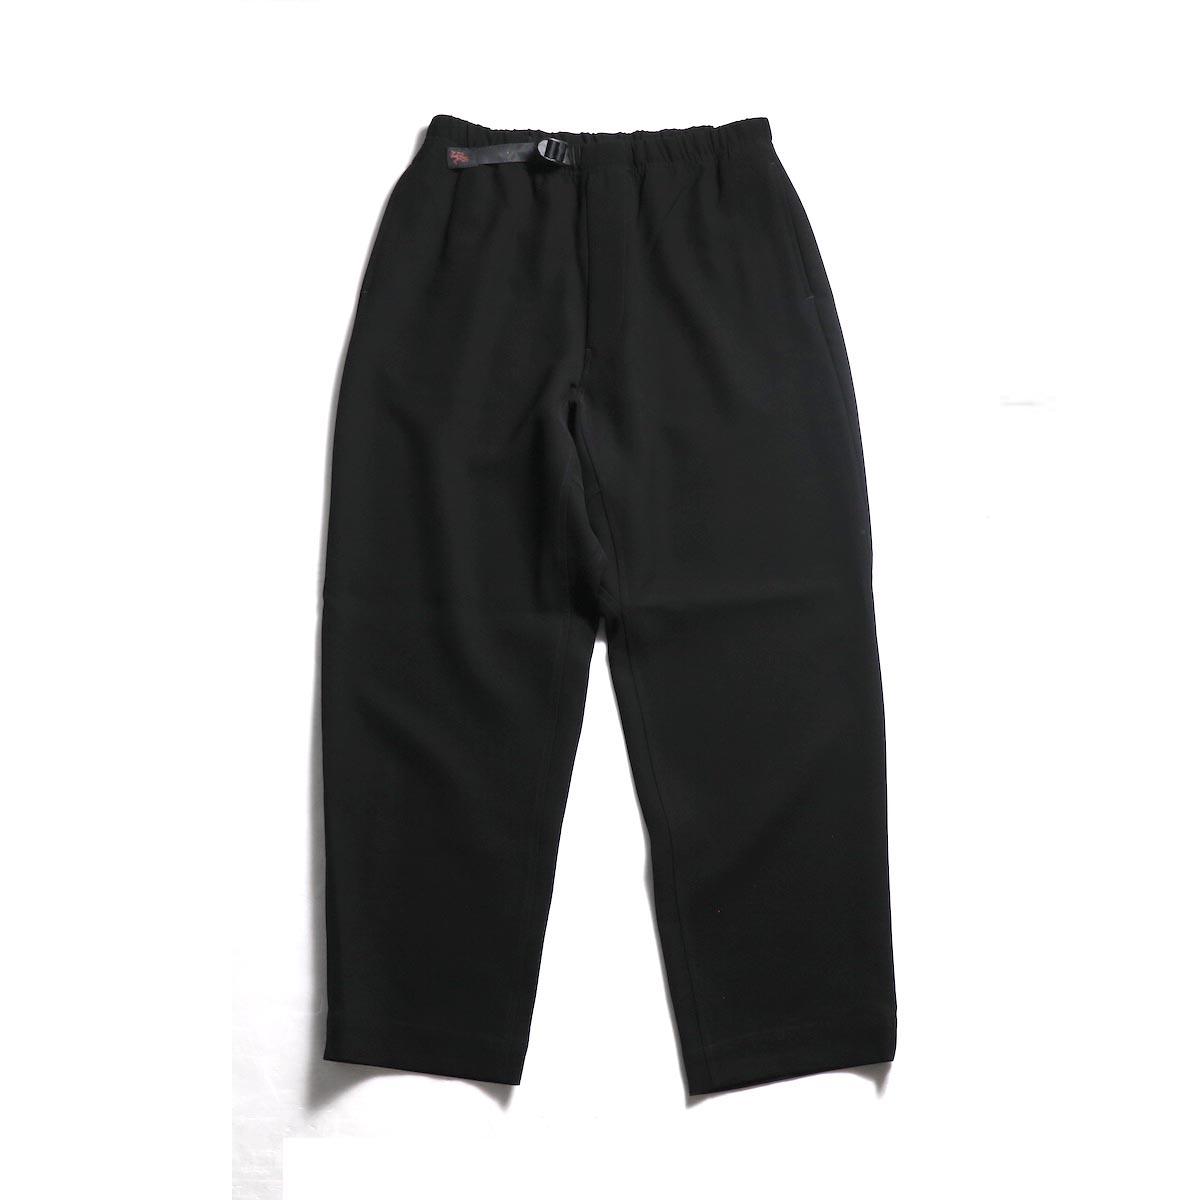 N.HOOLYWOOD × GRAMICCI / 292-PT10-028 Wide Easy Pants -Black